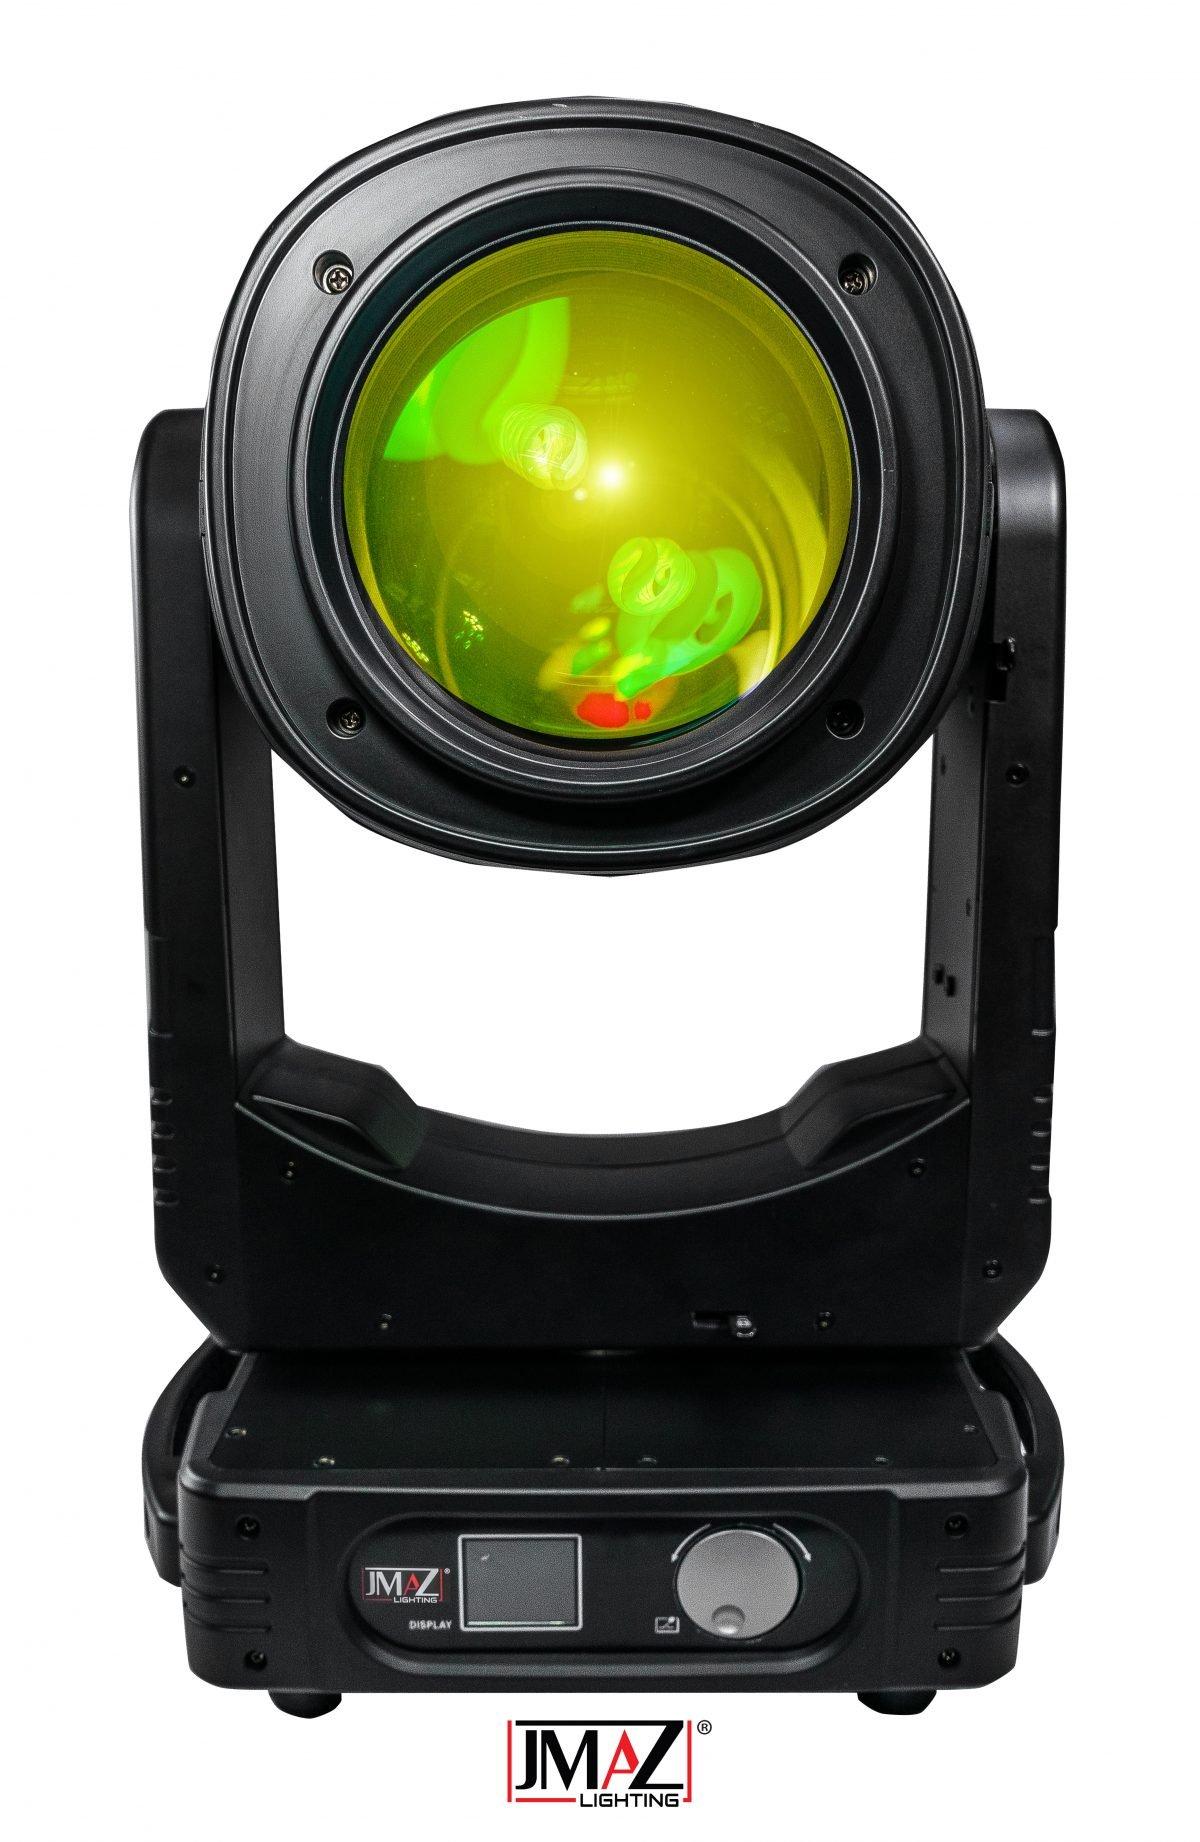 jmaz-vision-hybrid-180.jpeg